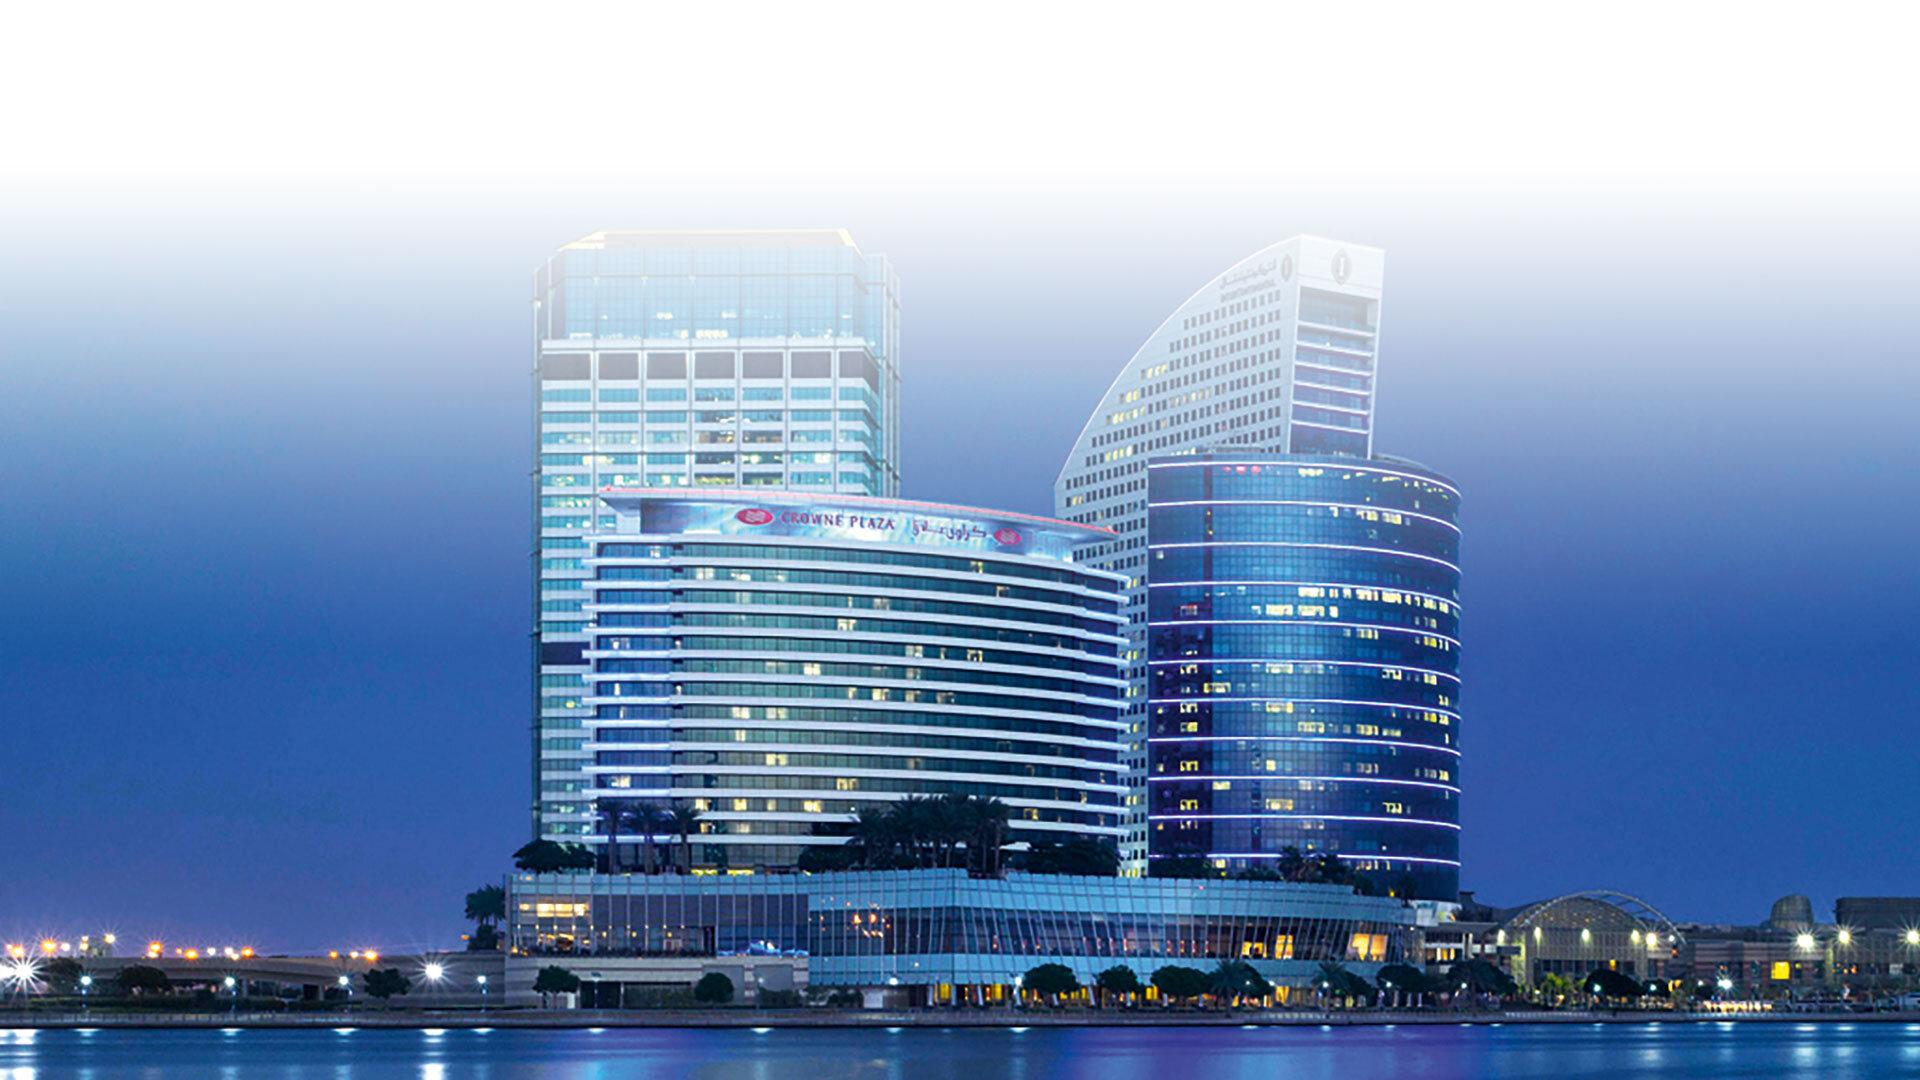 Hotel Crown Plaza Dubai